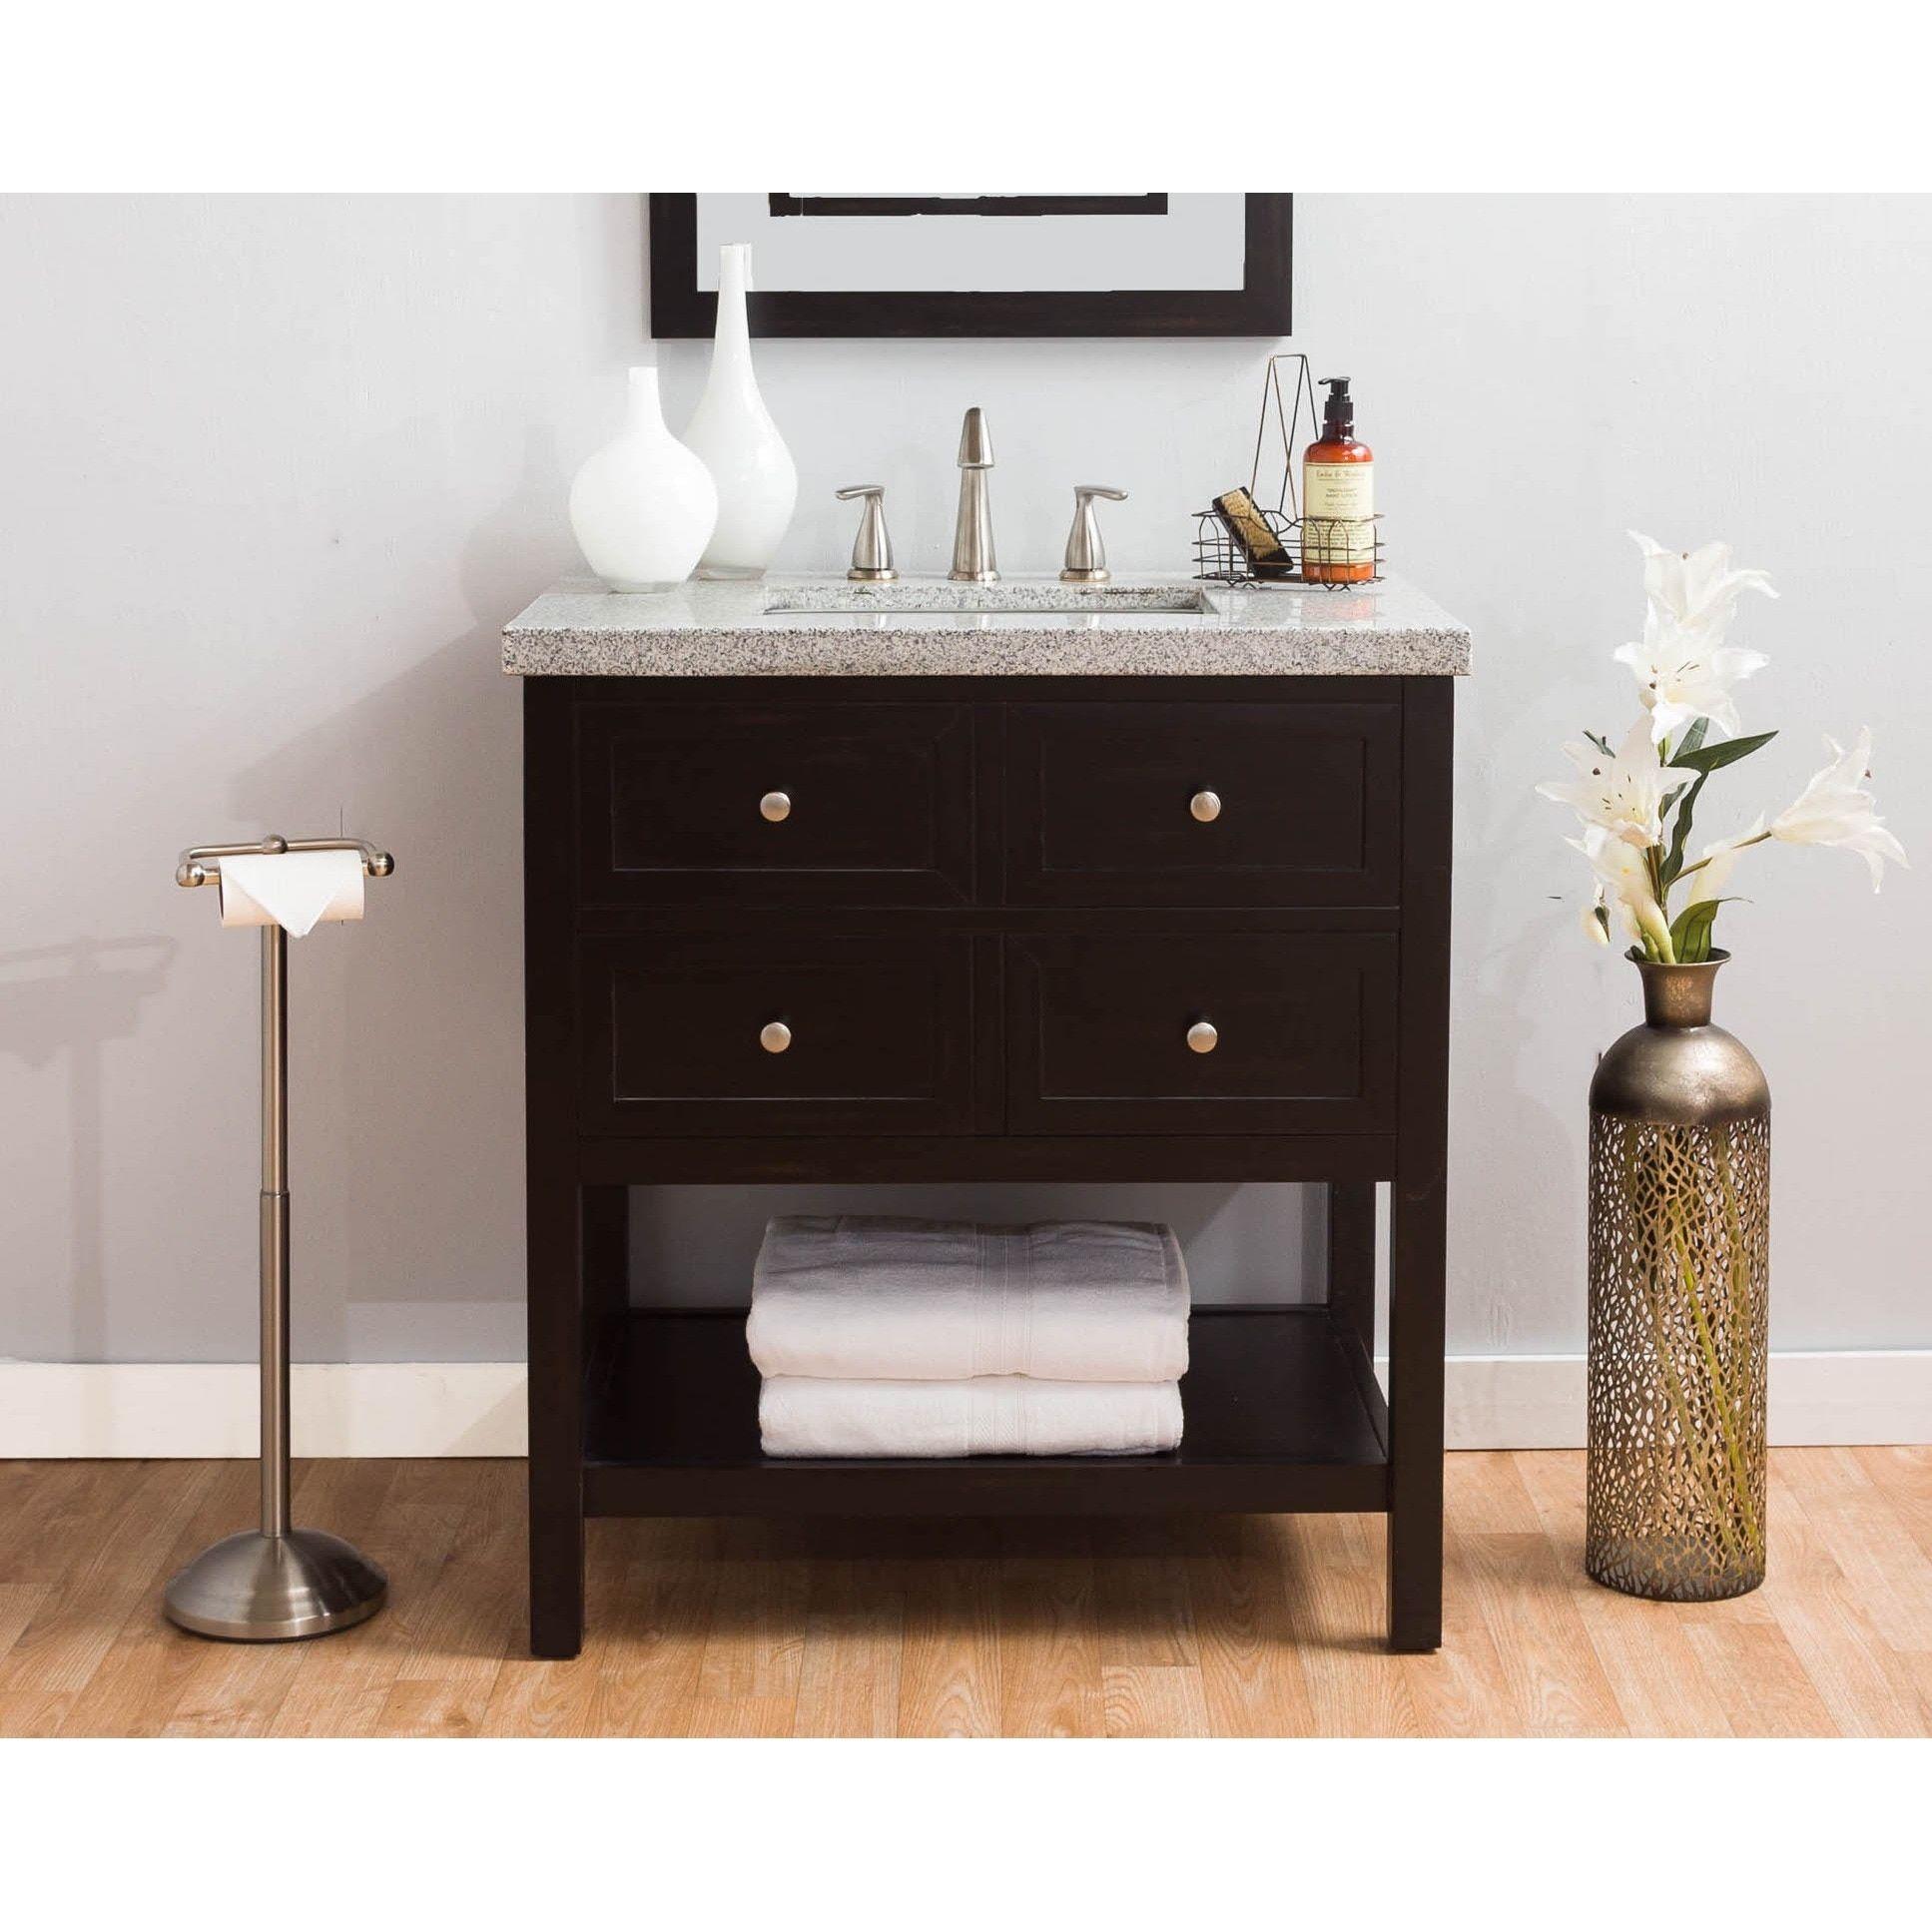 vanity sink and small bathroom furniture custom less cabinets for in vanities black